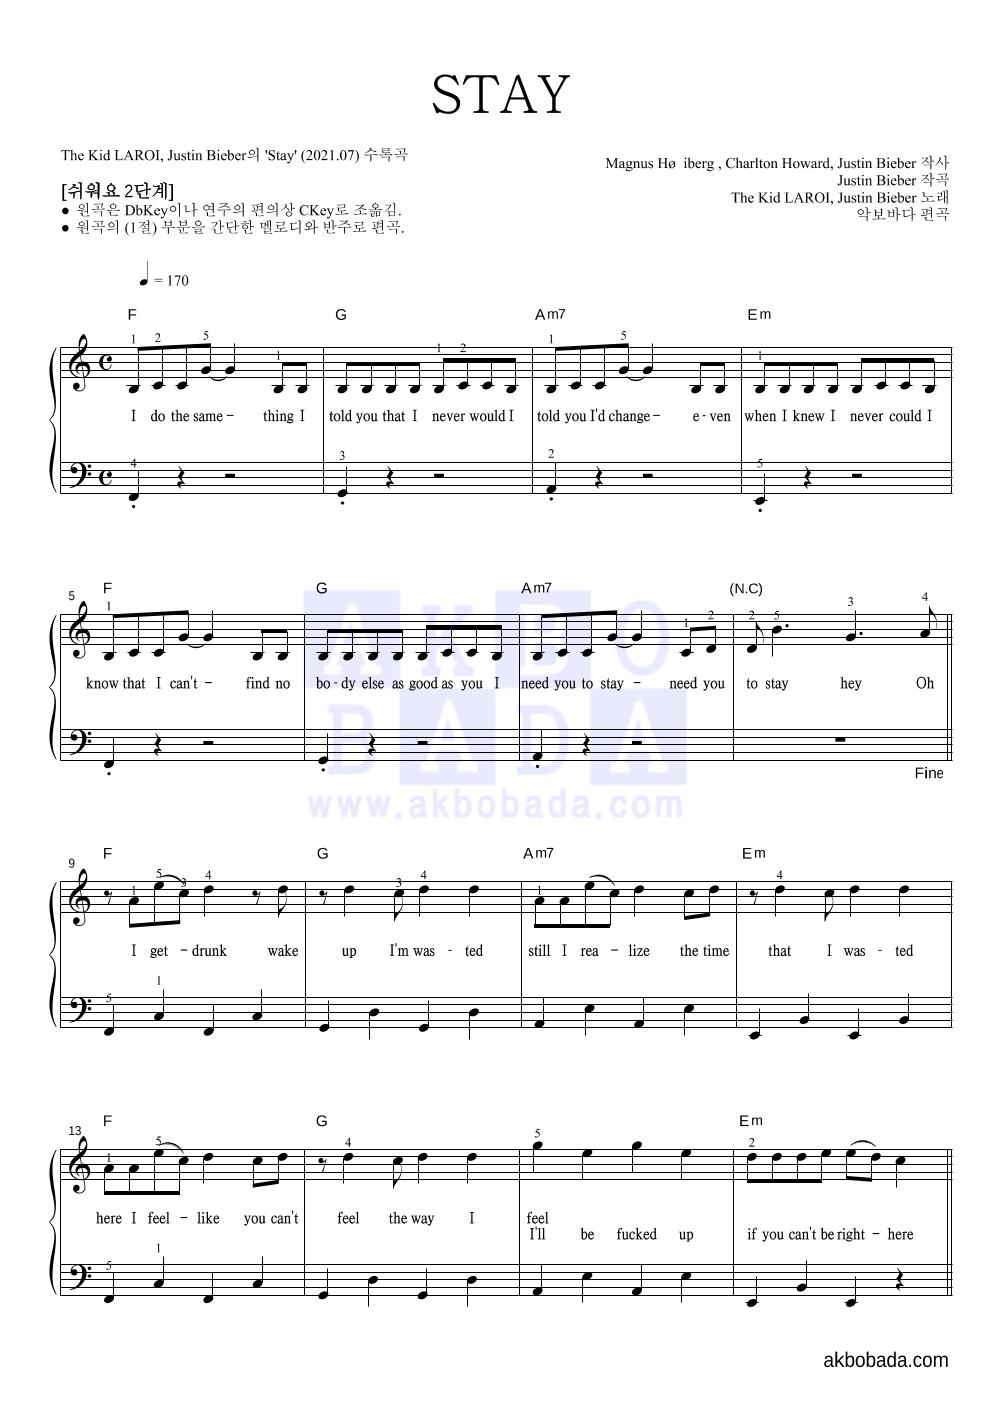 The Kid LAROI,Justin Bieber - STAY 피아노2단-쉬워요 악보